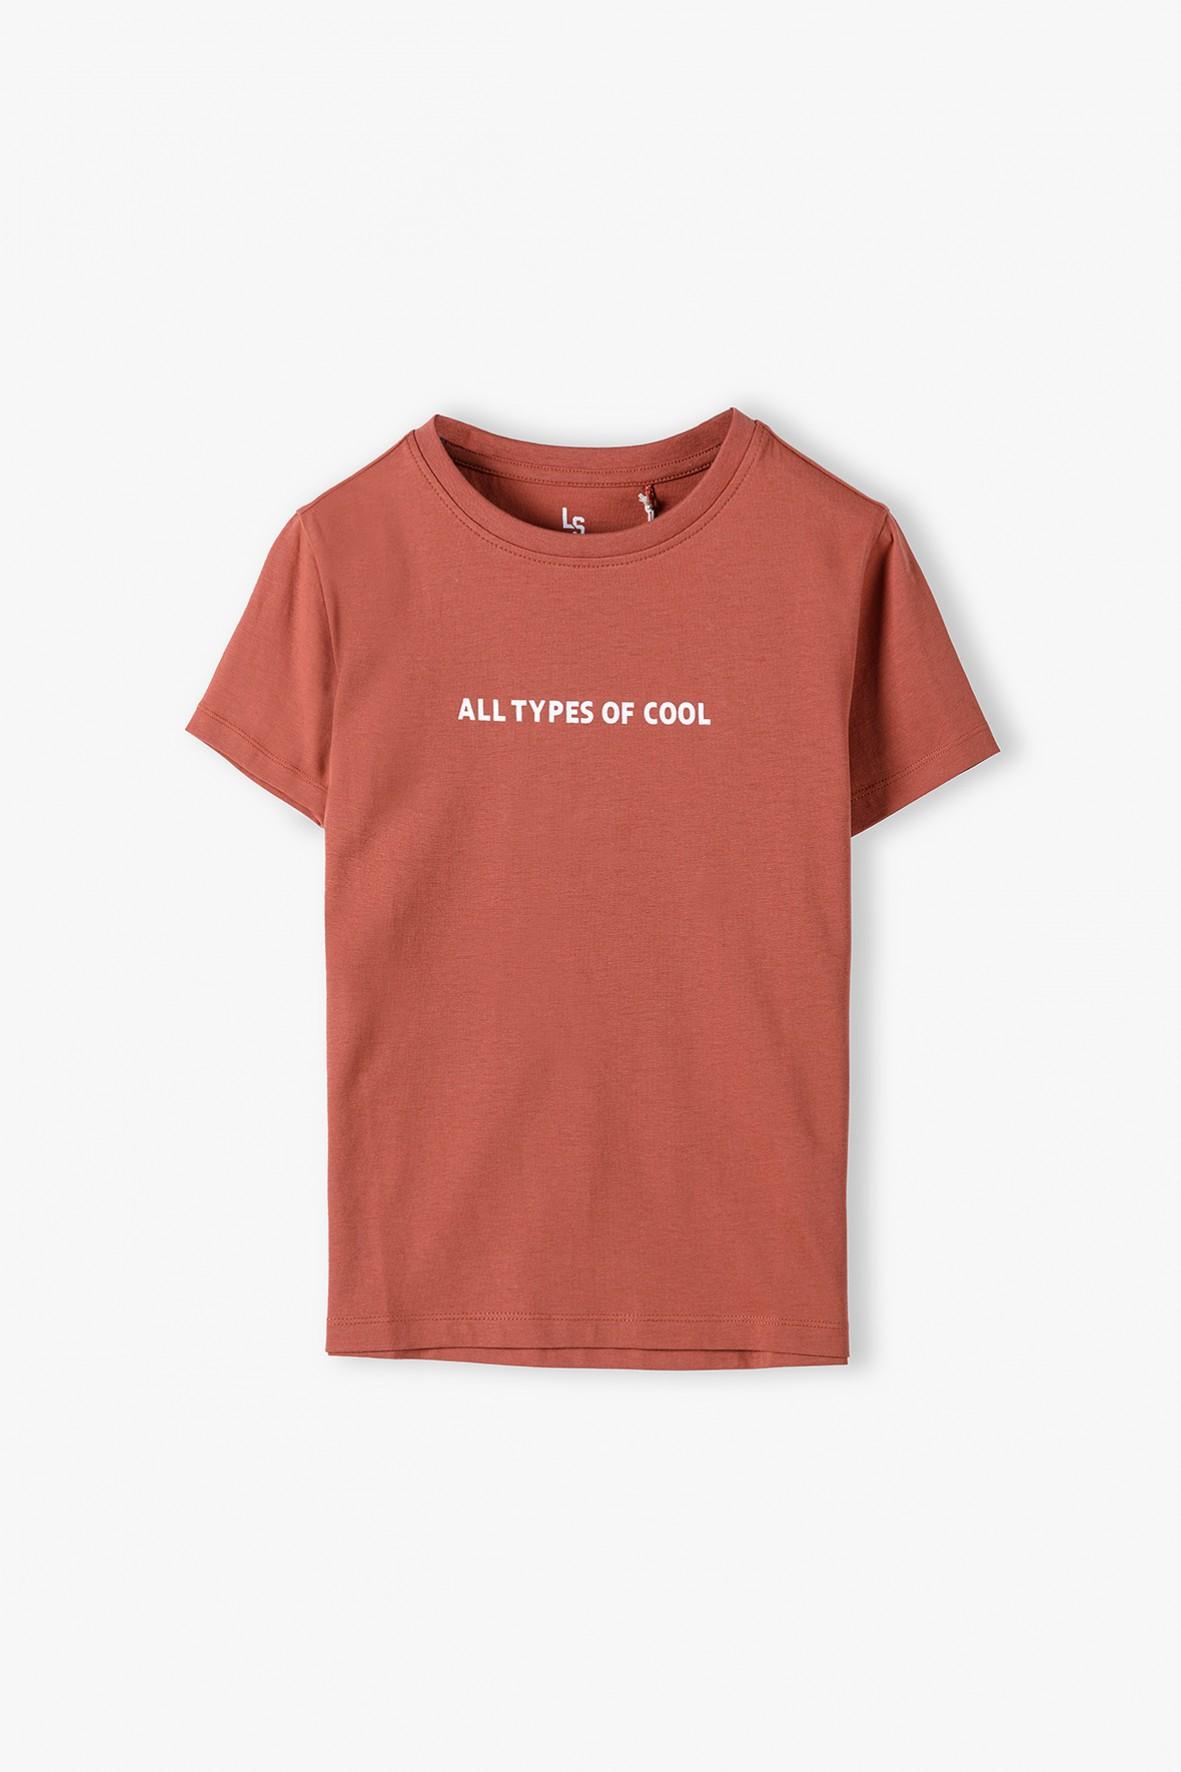 T-shirt chłopięcy - All types of cool